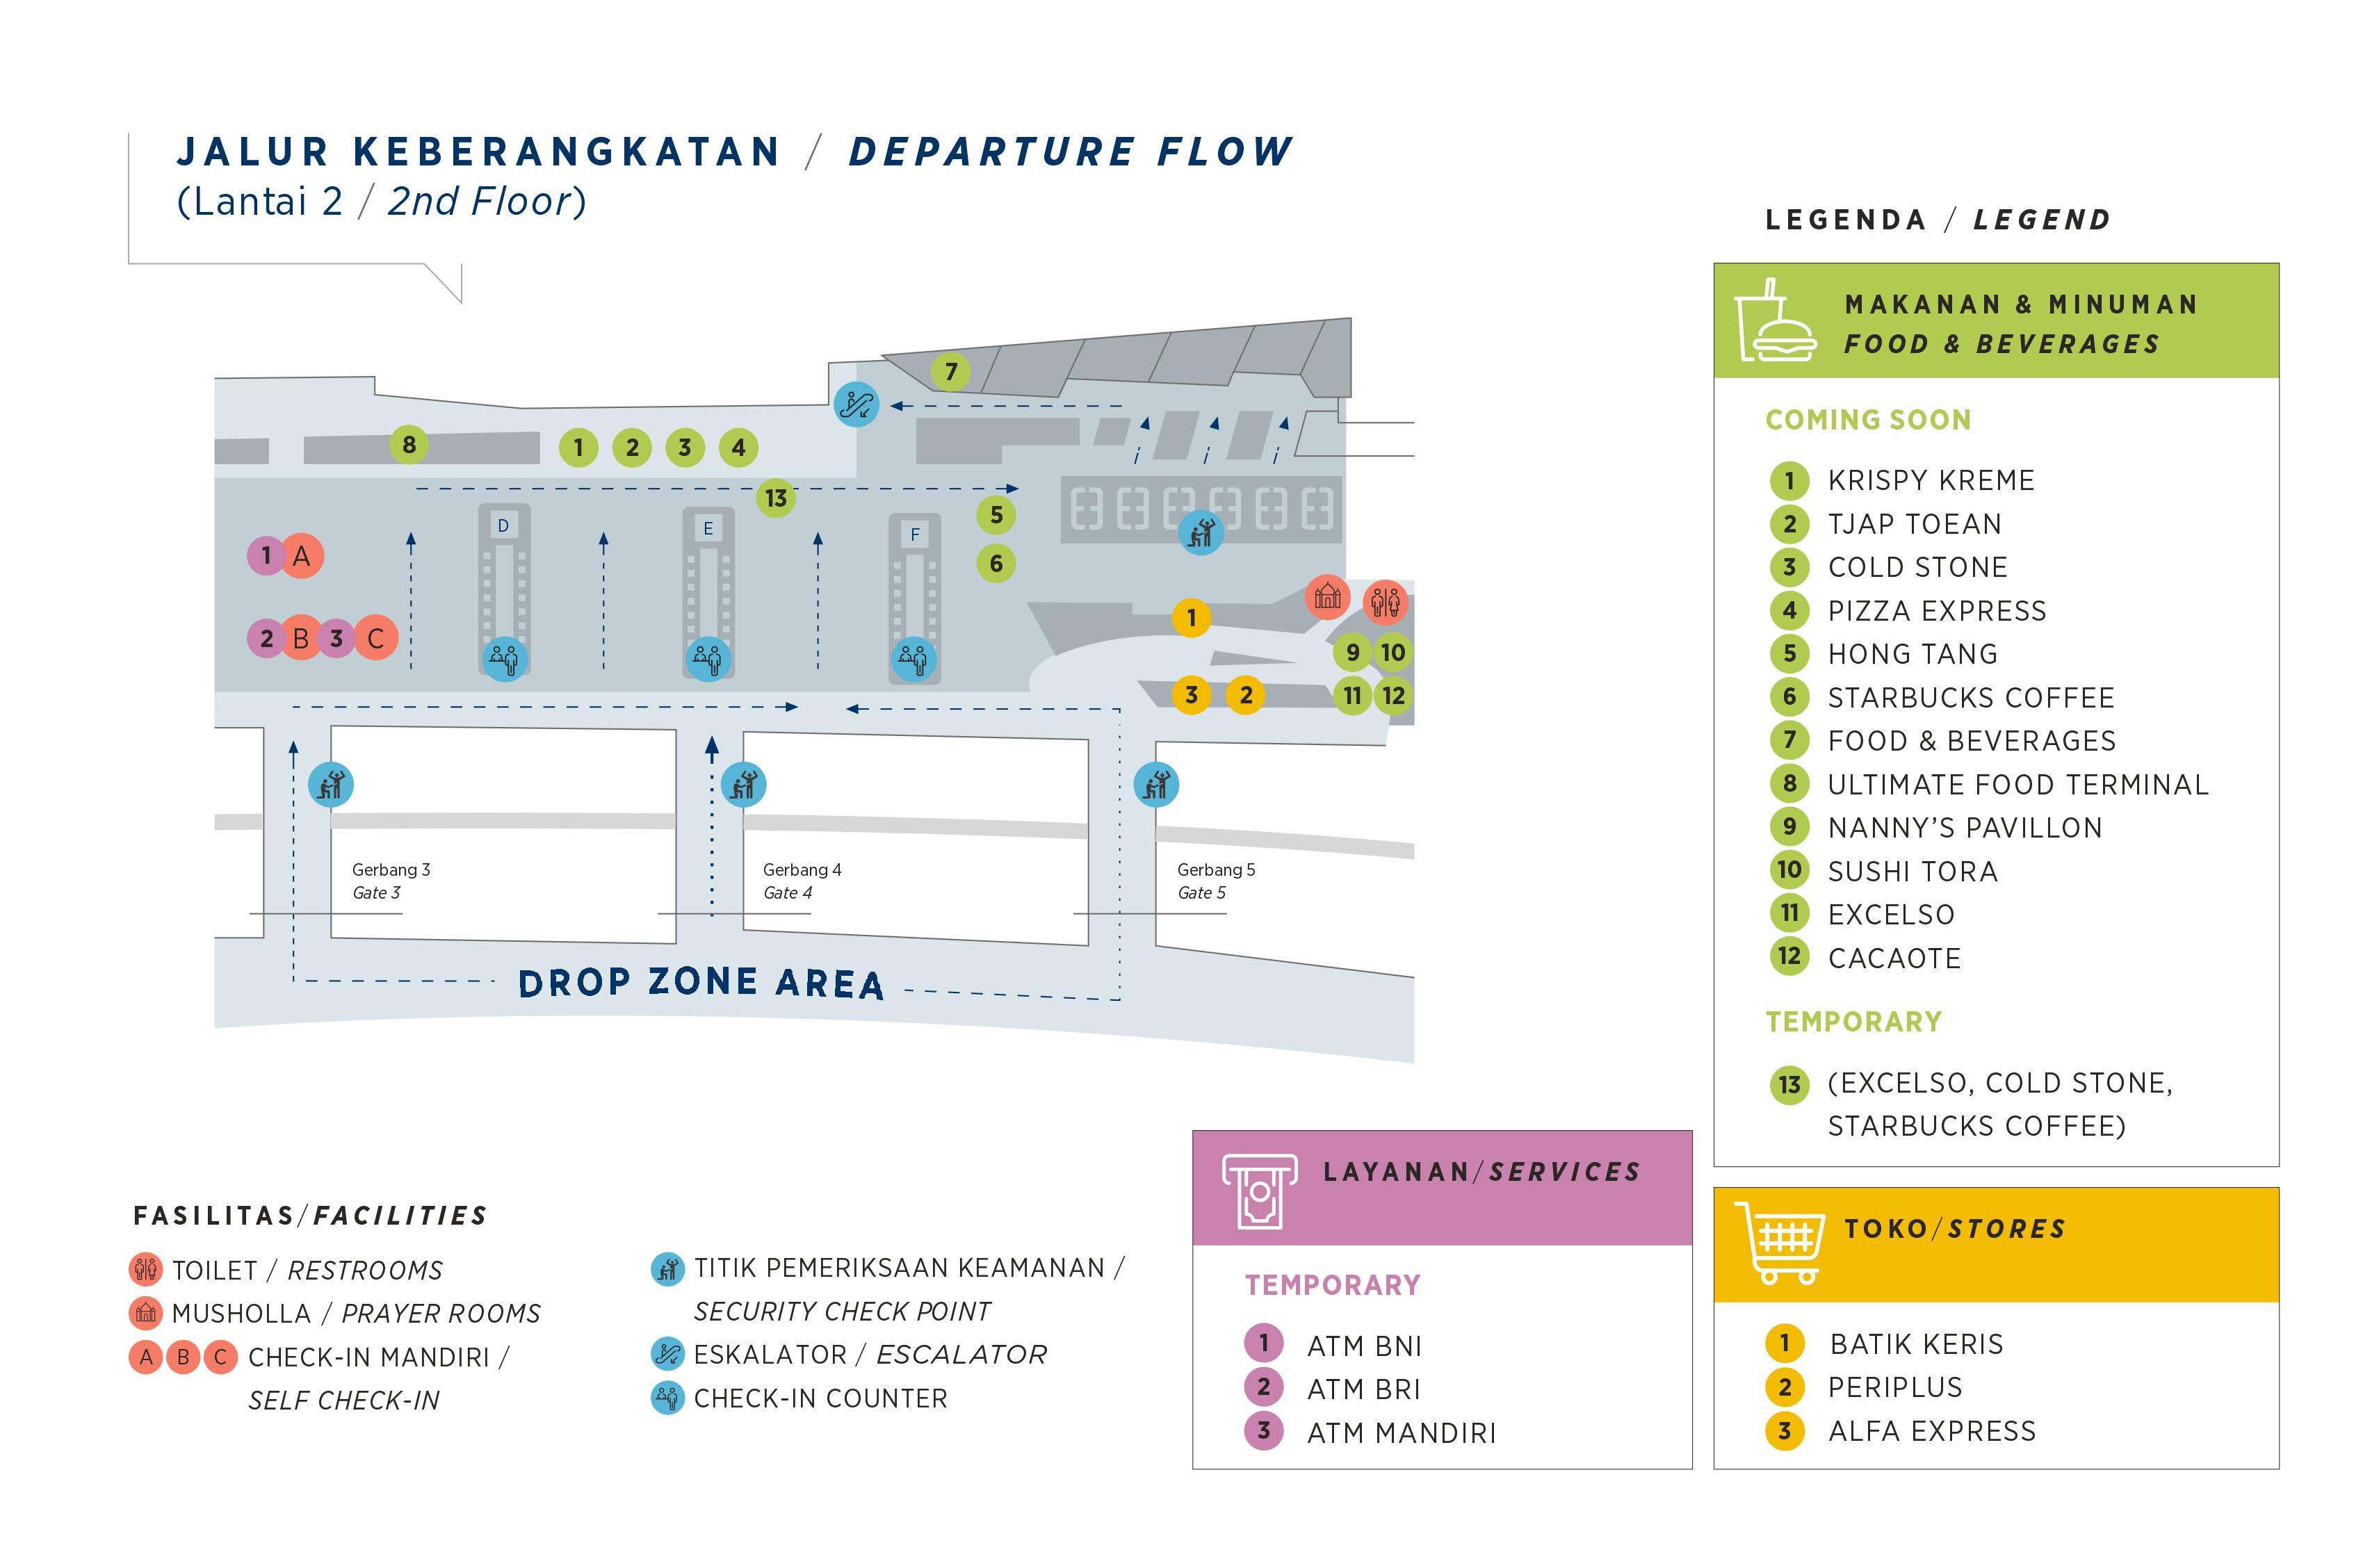 Peta Terminal 3 Bandara Soekarno Hatta – Notordinaryblogger